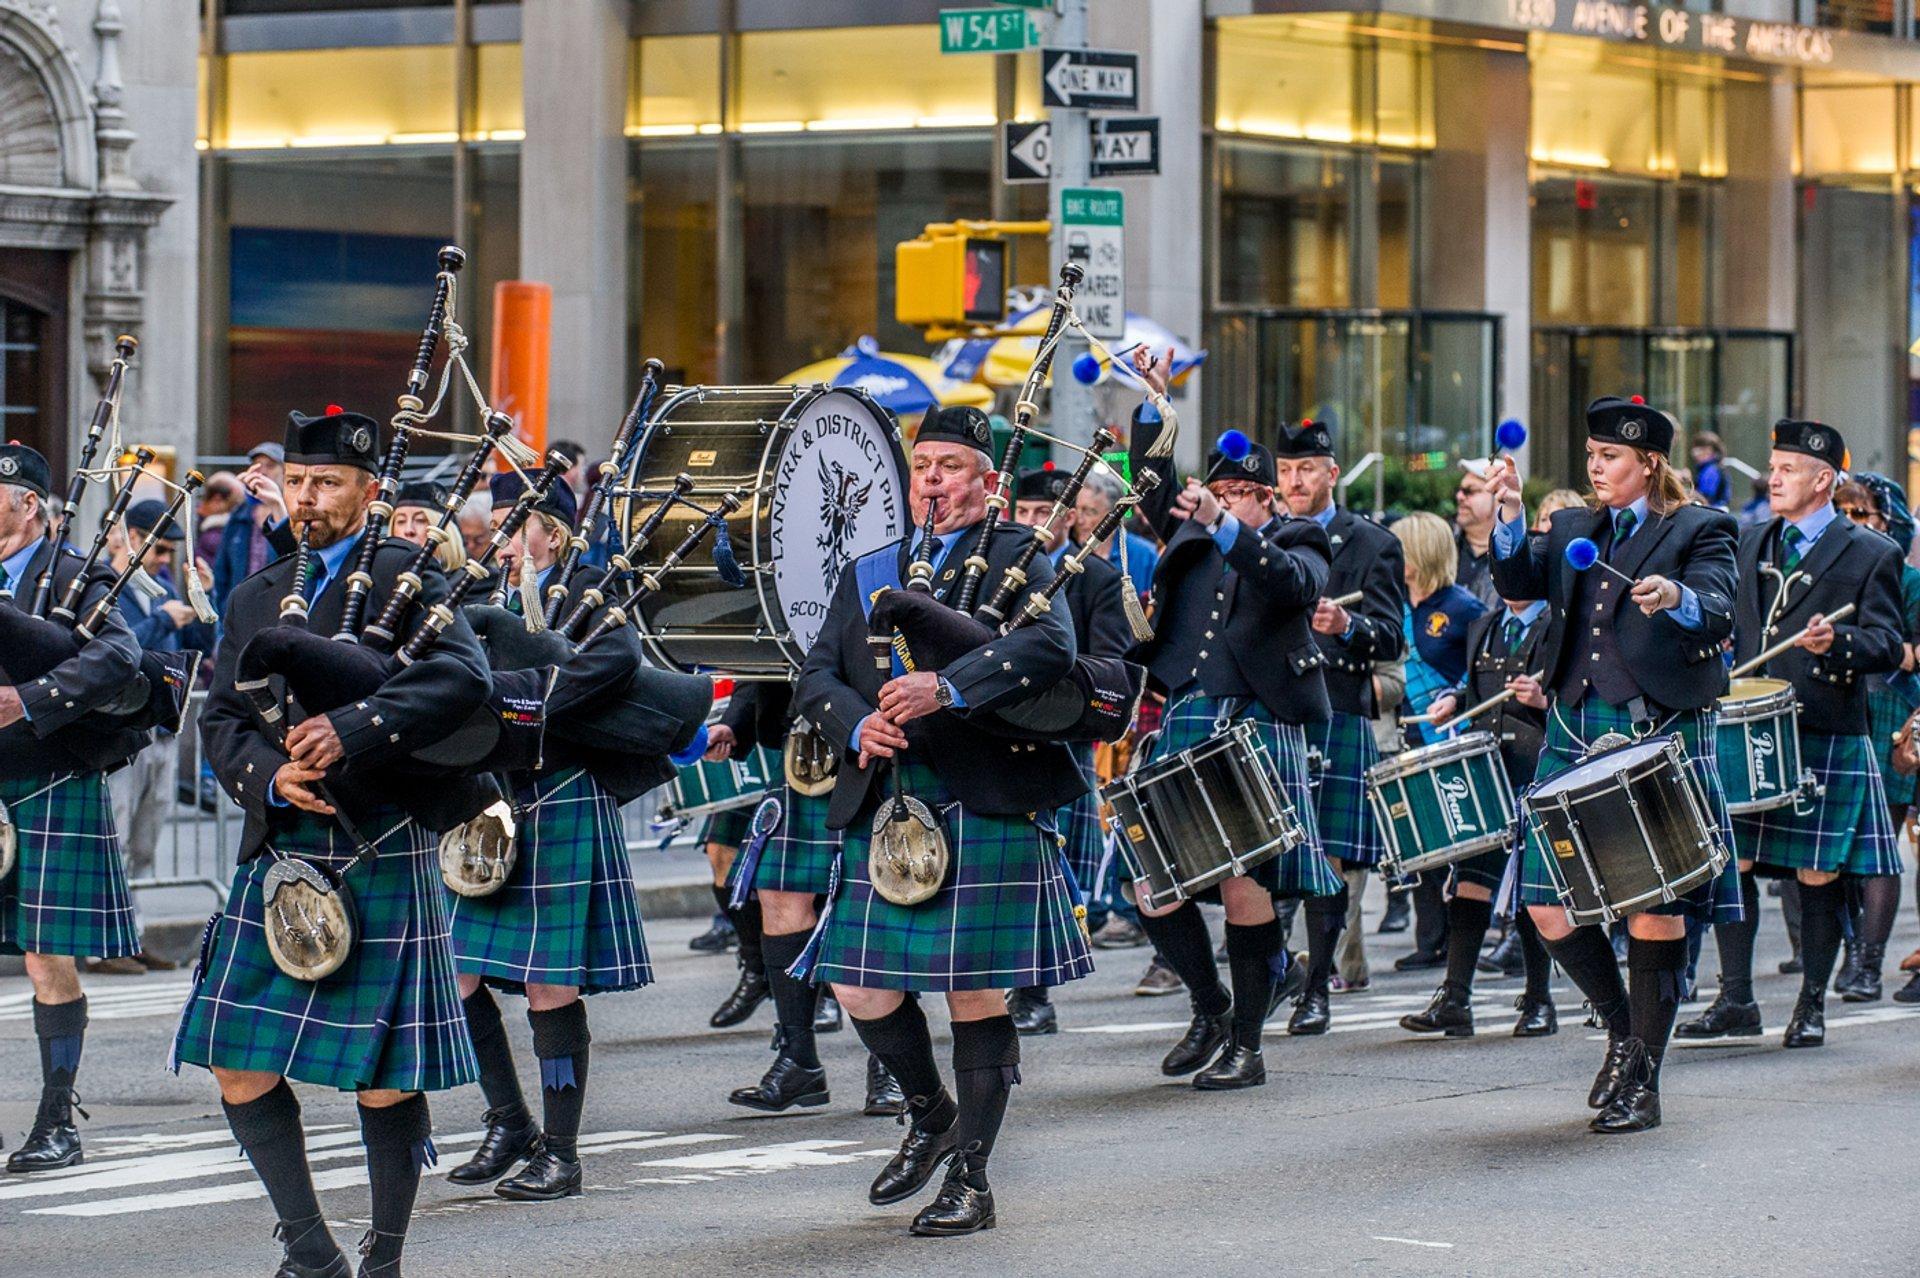 New York City Tartan Day Parade in New York - Best Season 2020